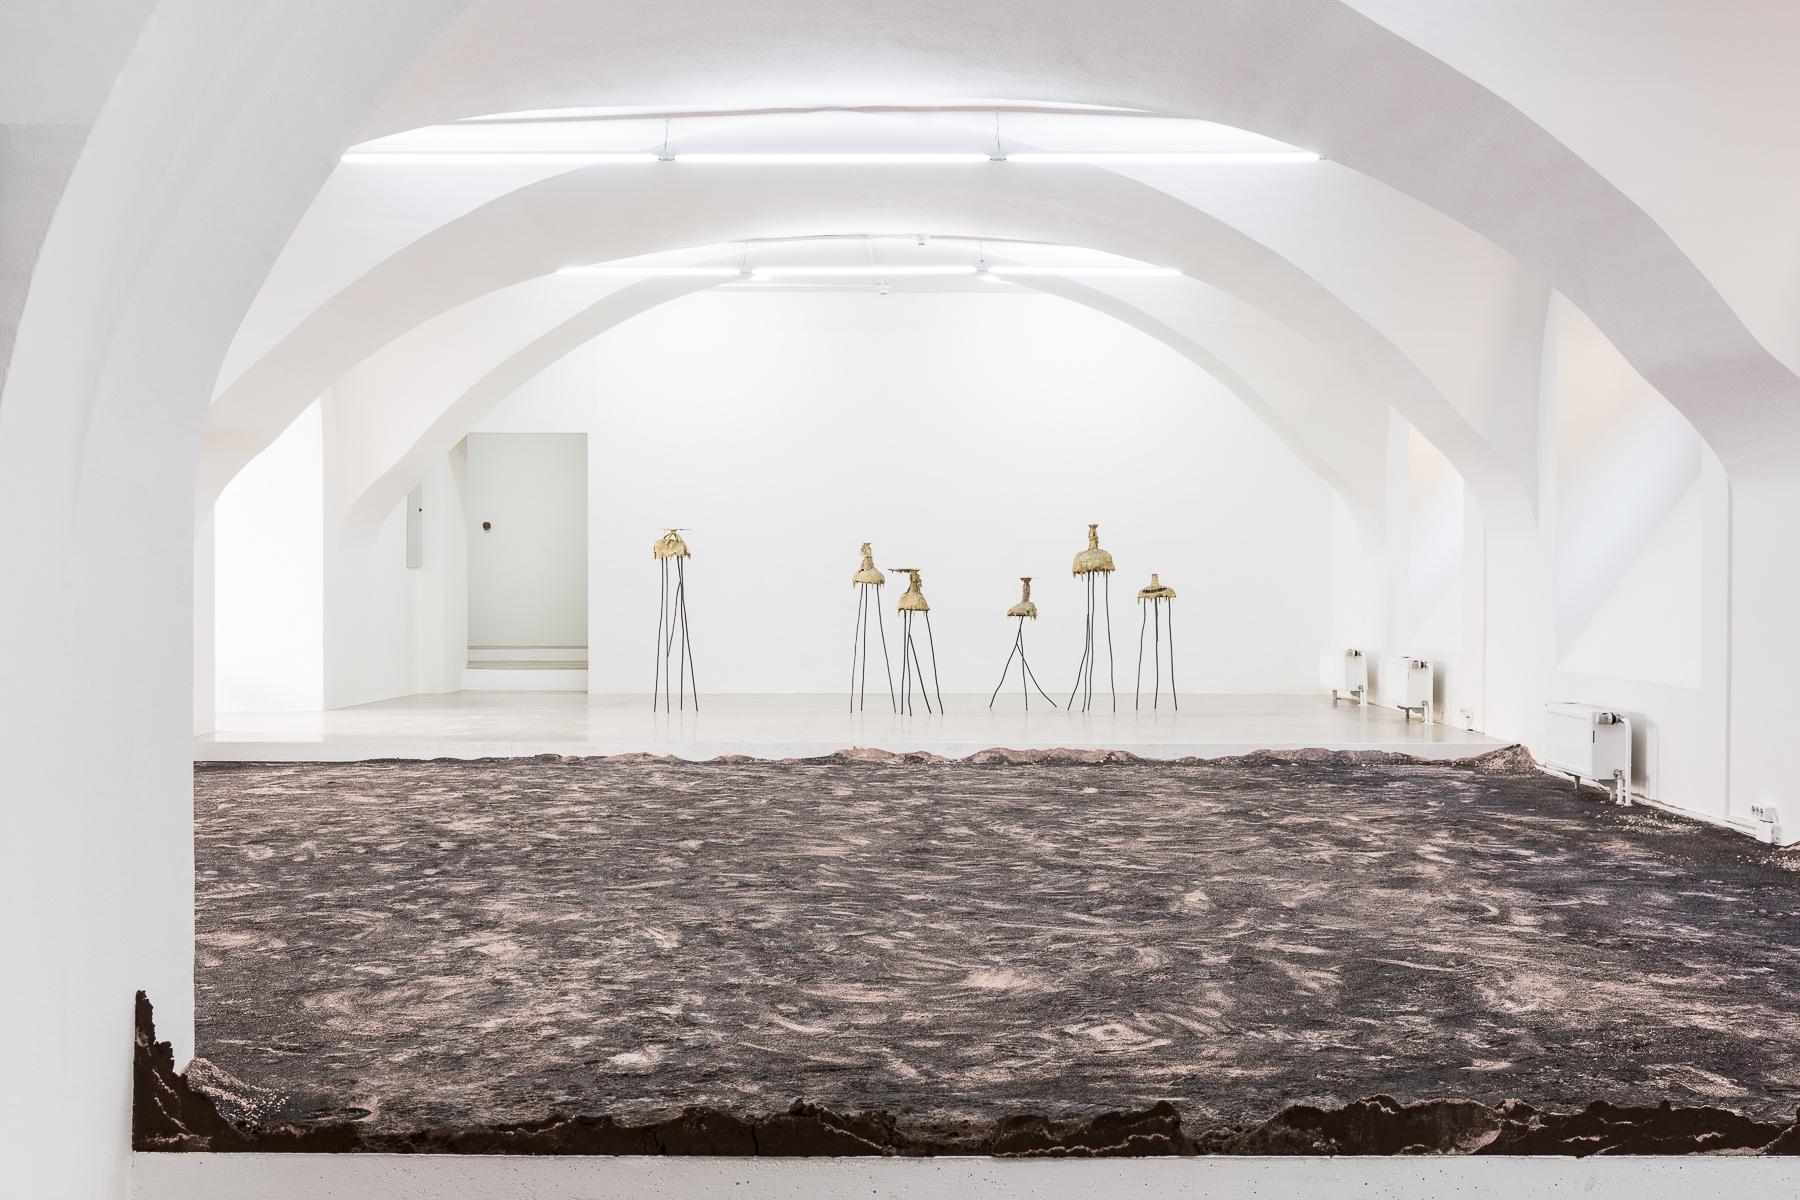 2019_02_19_Angelika Loderer_Kunstverein Graz_by_kunstdokumentationcom_001_web.jpg